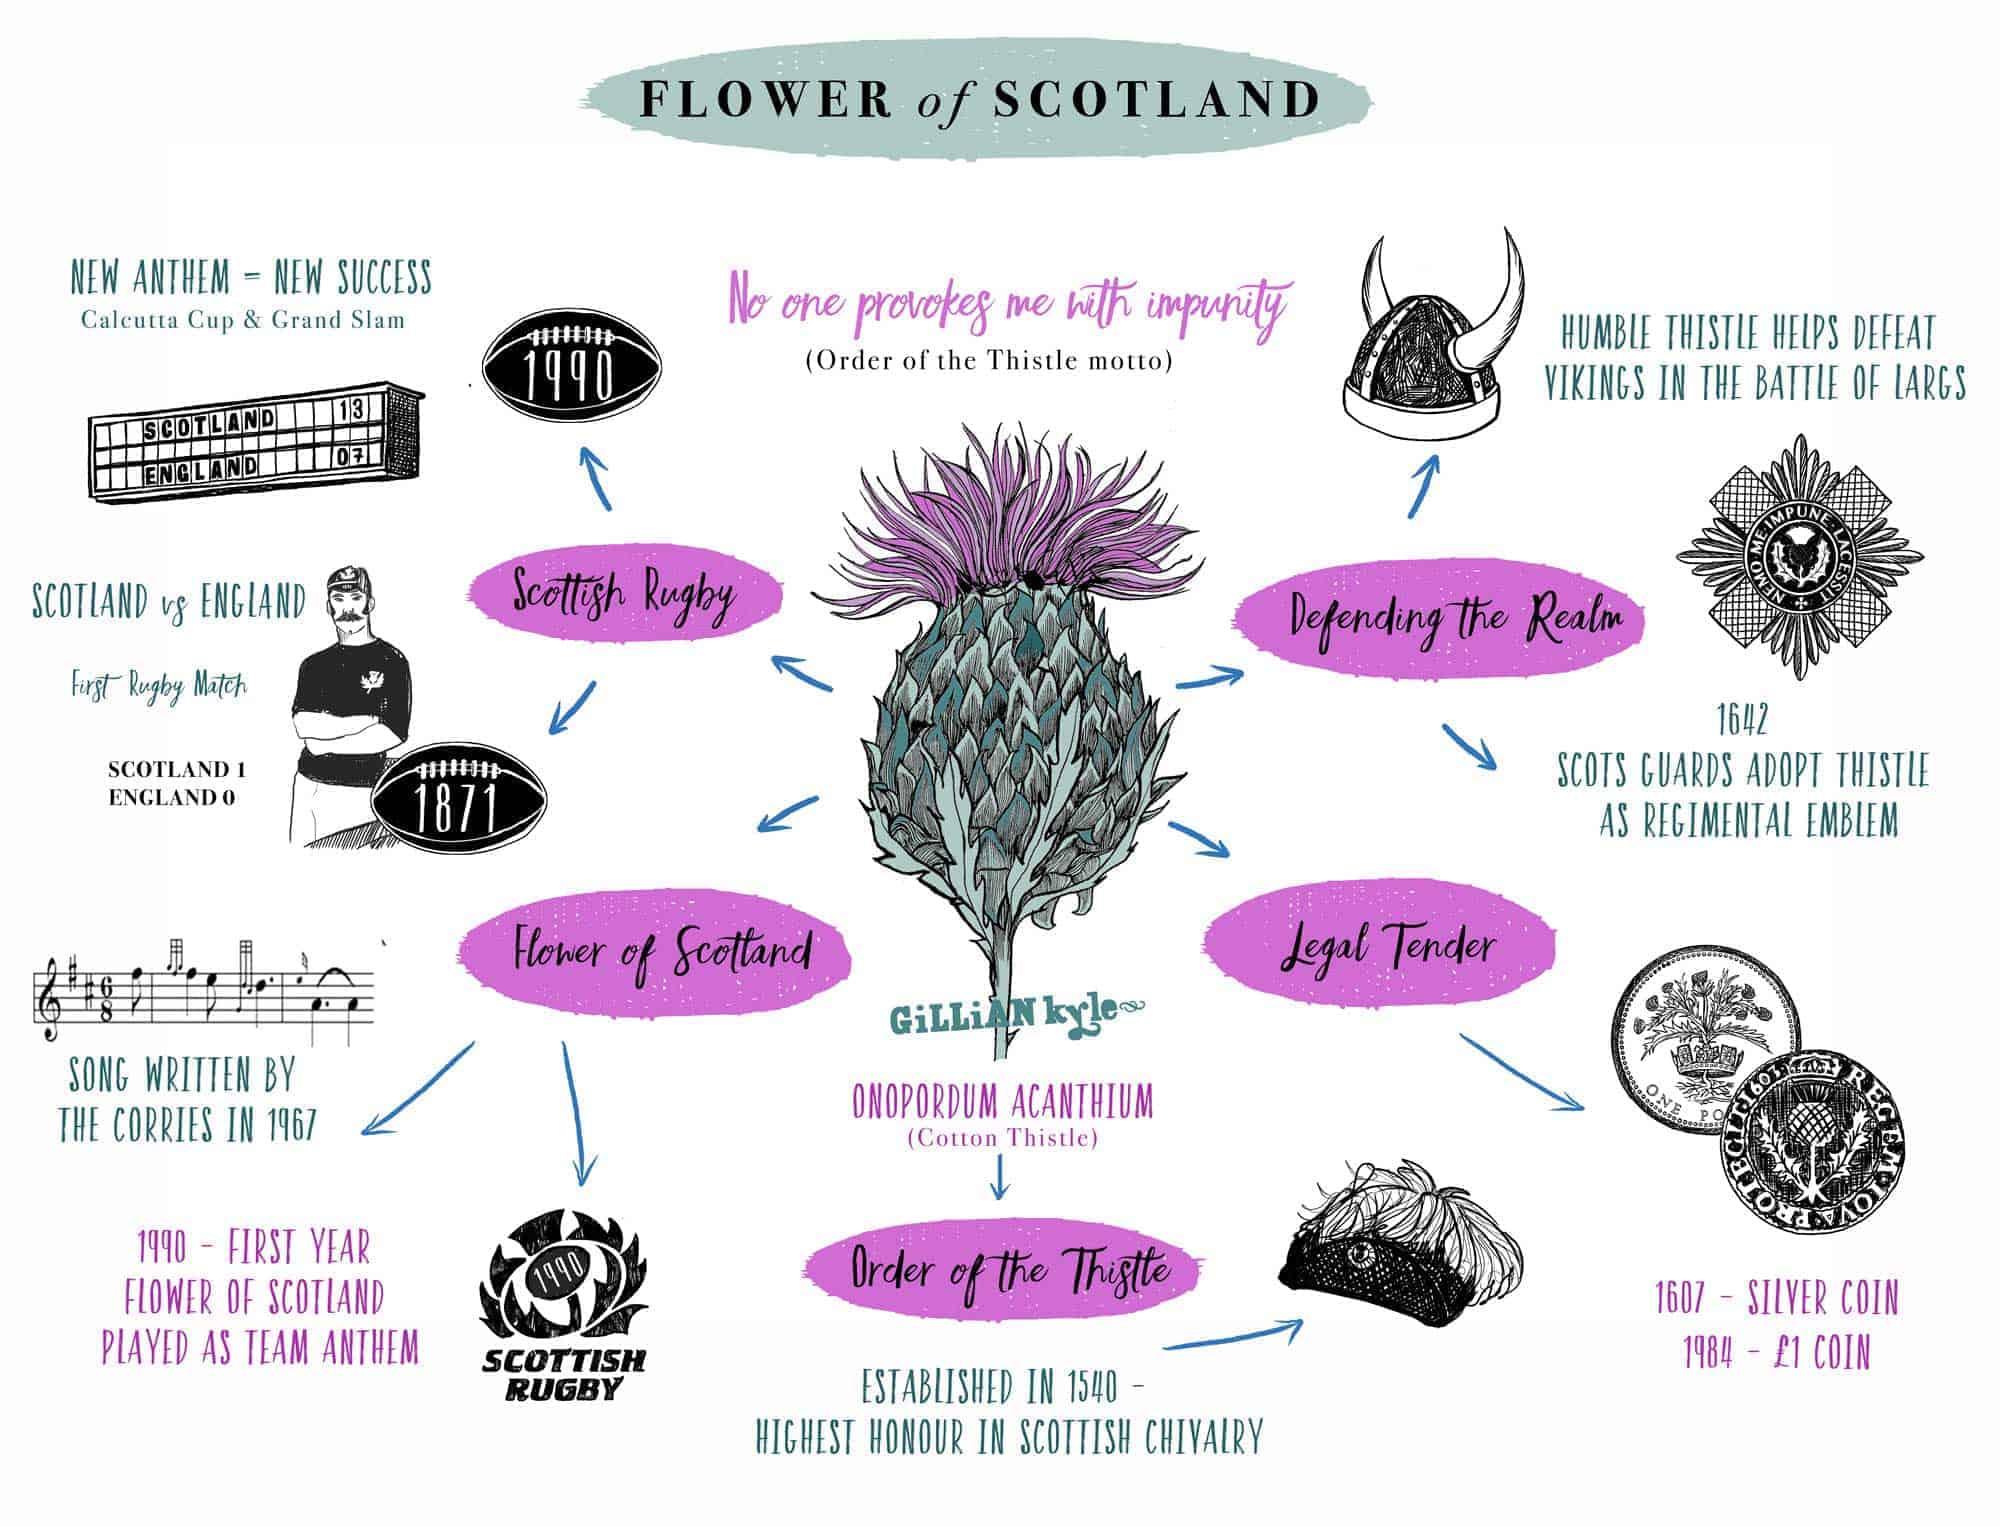 Scotland's National Flower - Thistle - YouTube